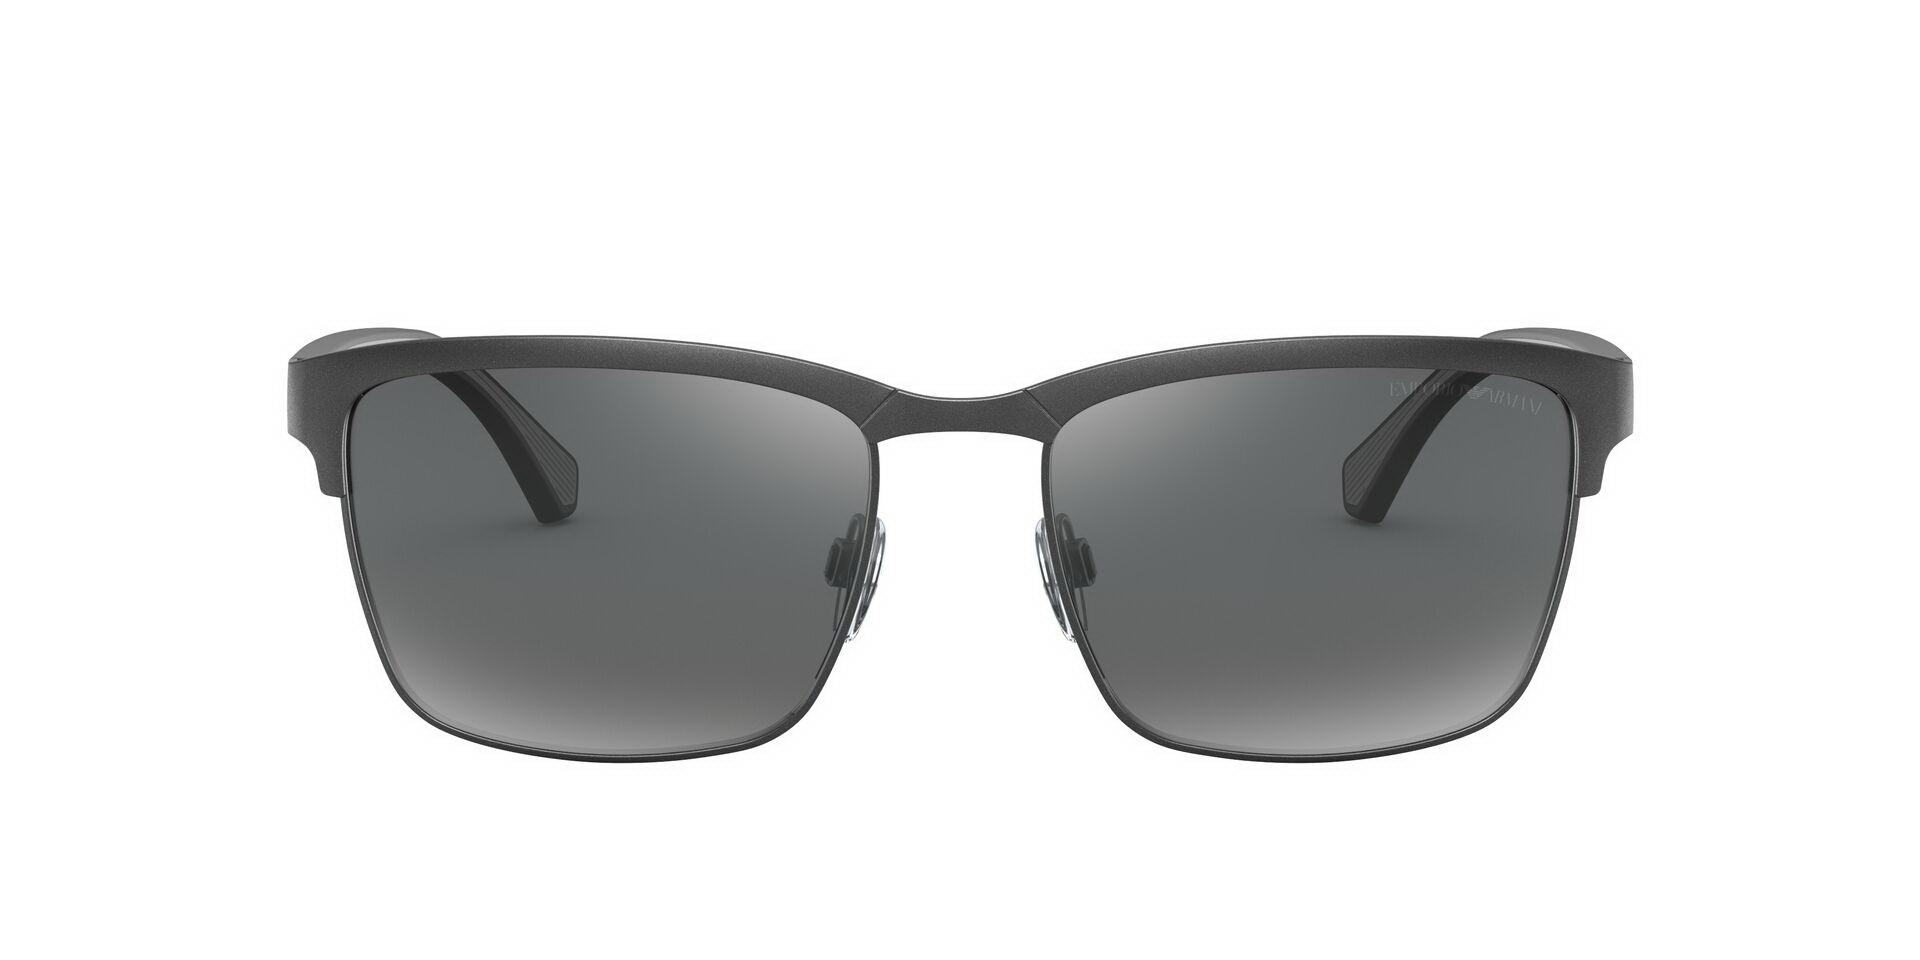 Солнцезащитные очки Очки с/з Emporio Armani 0EA2087 32946G